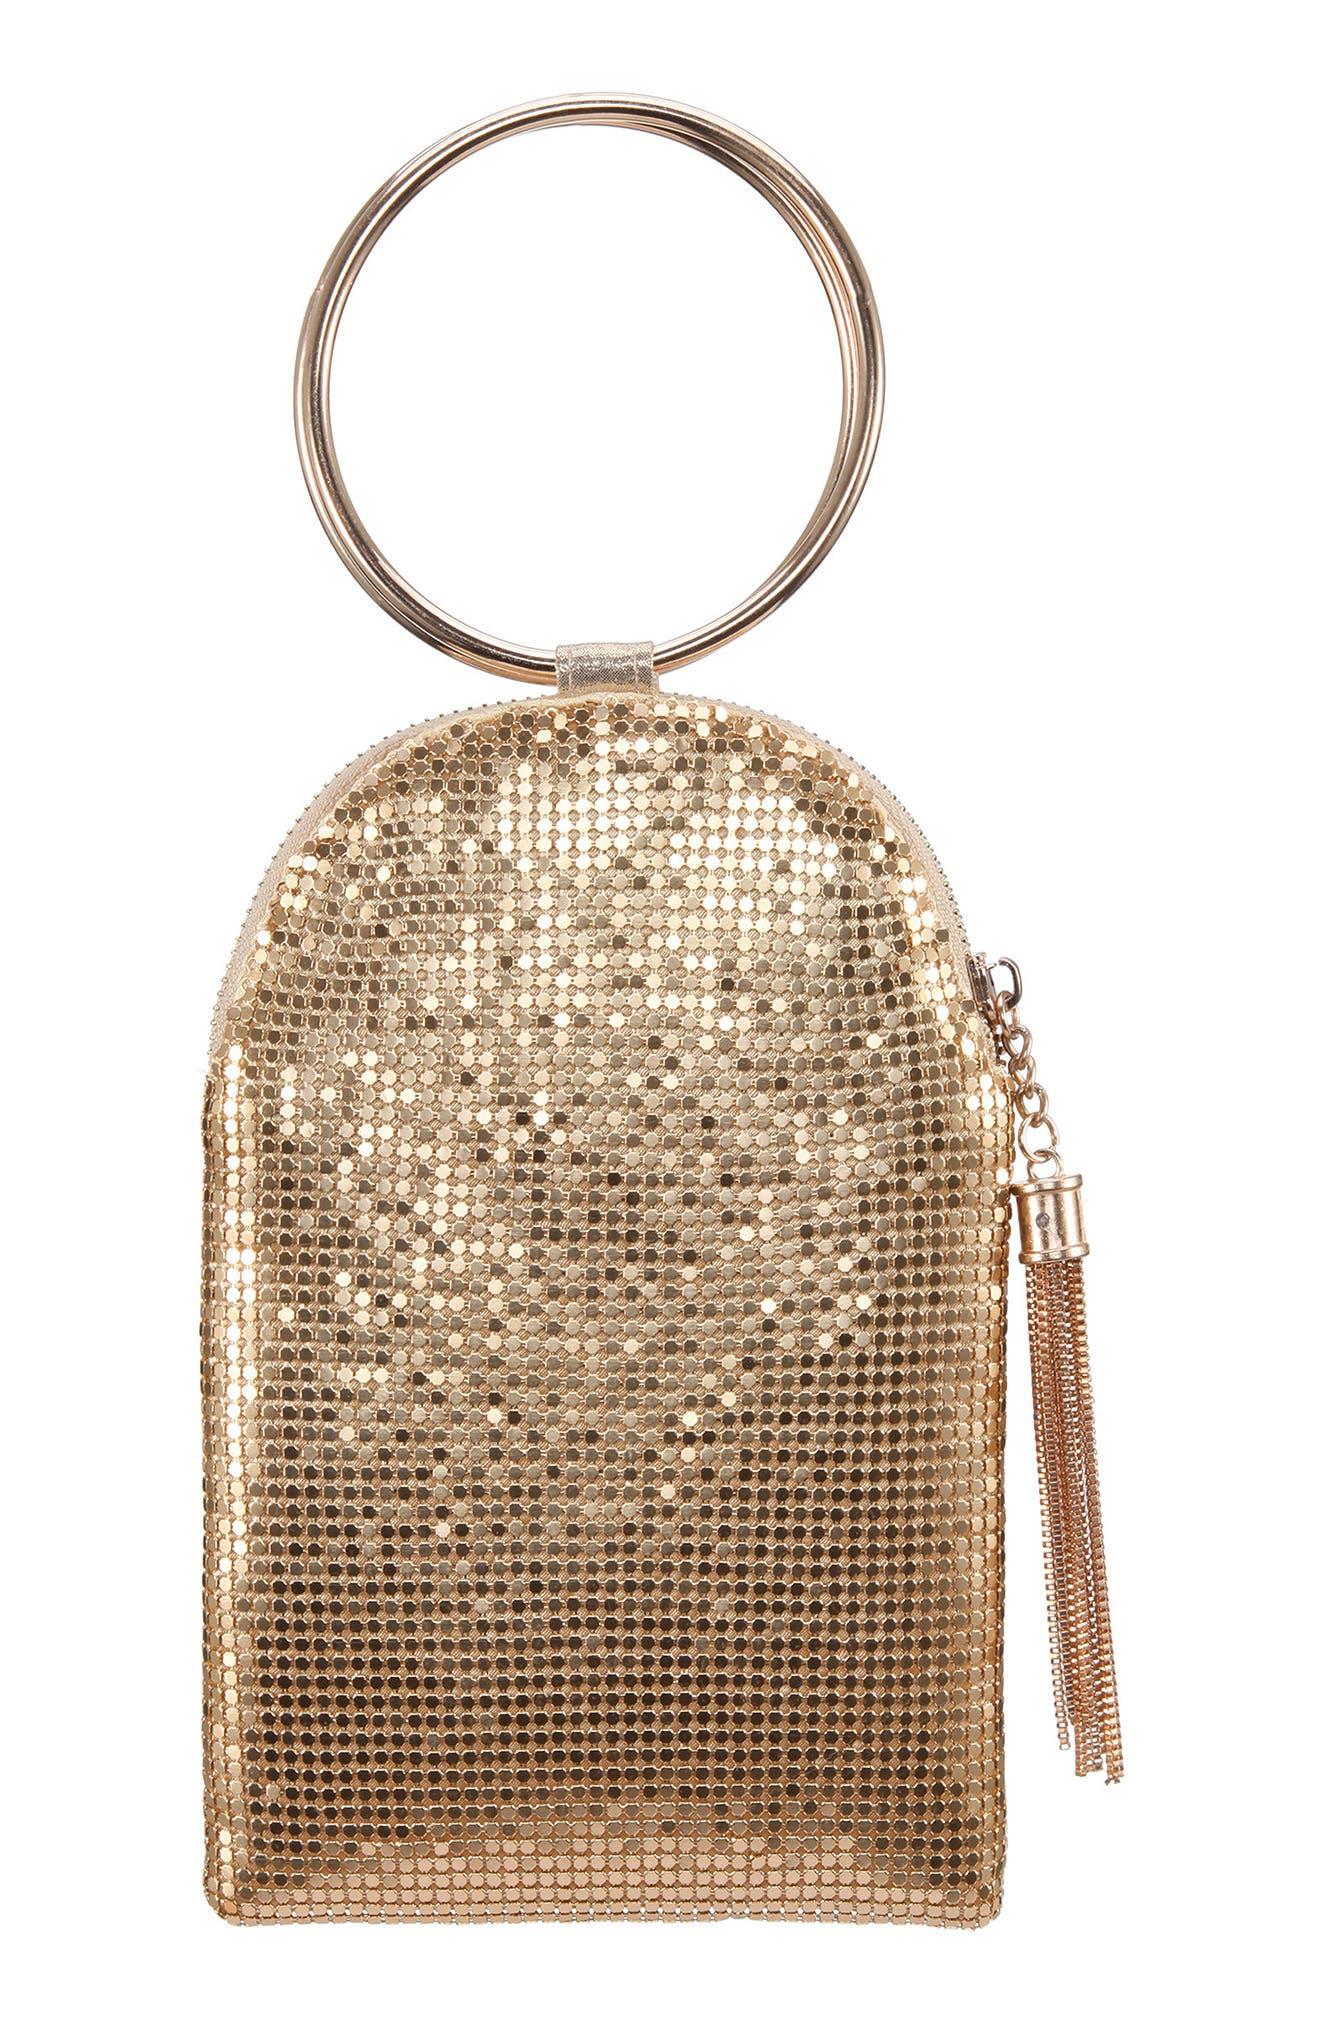 Vintage Handbags, Purses, Bags *New* Nina Metallic Mesh Handbag - Metallic $58.00 AT vintagedancer.com